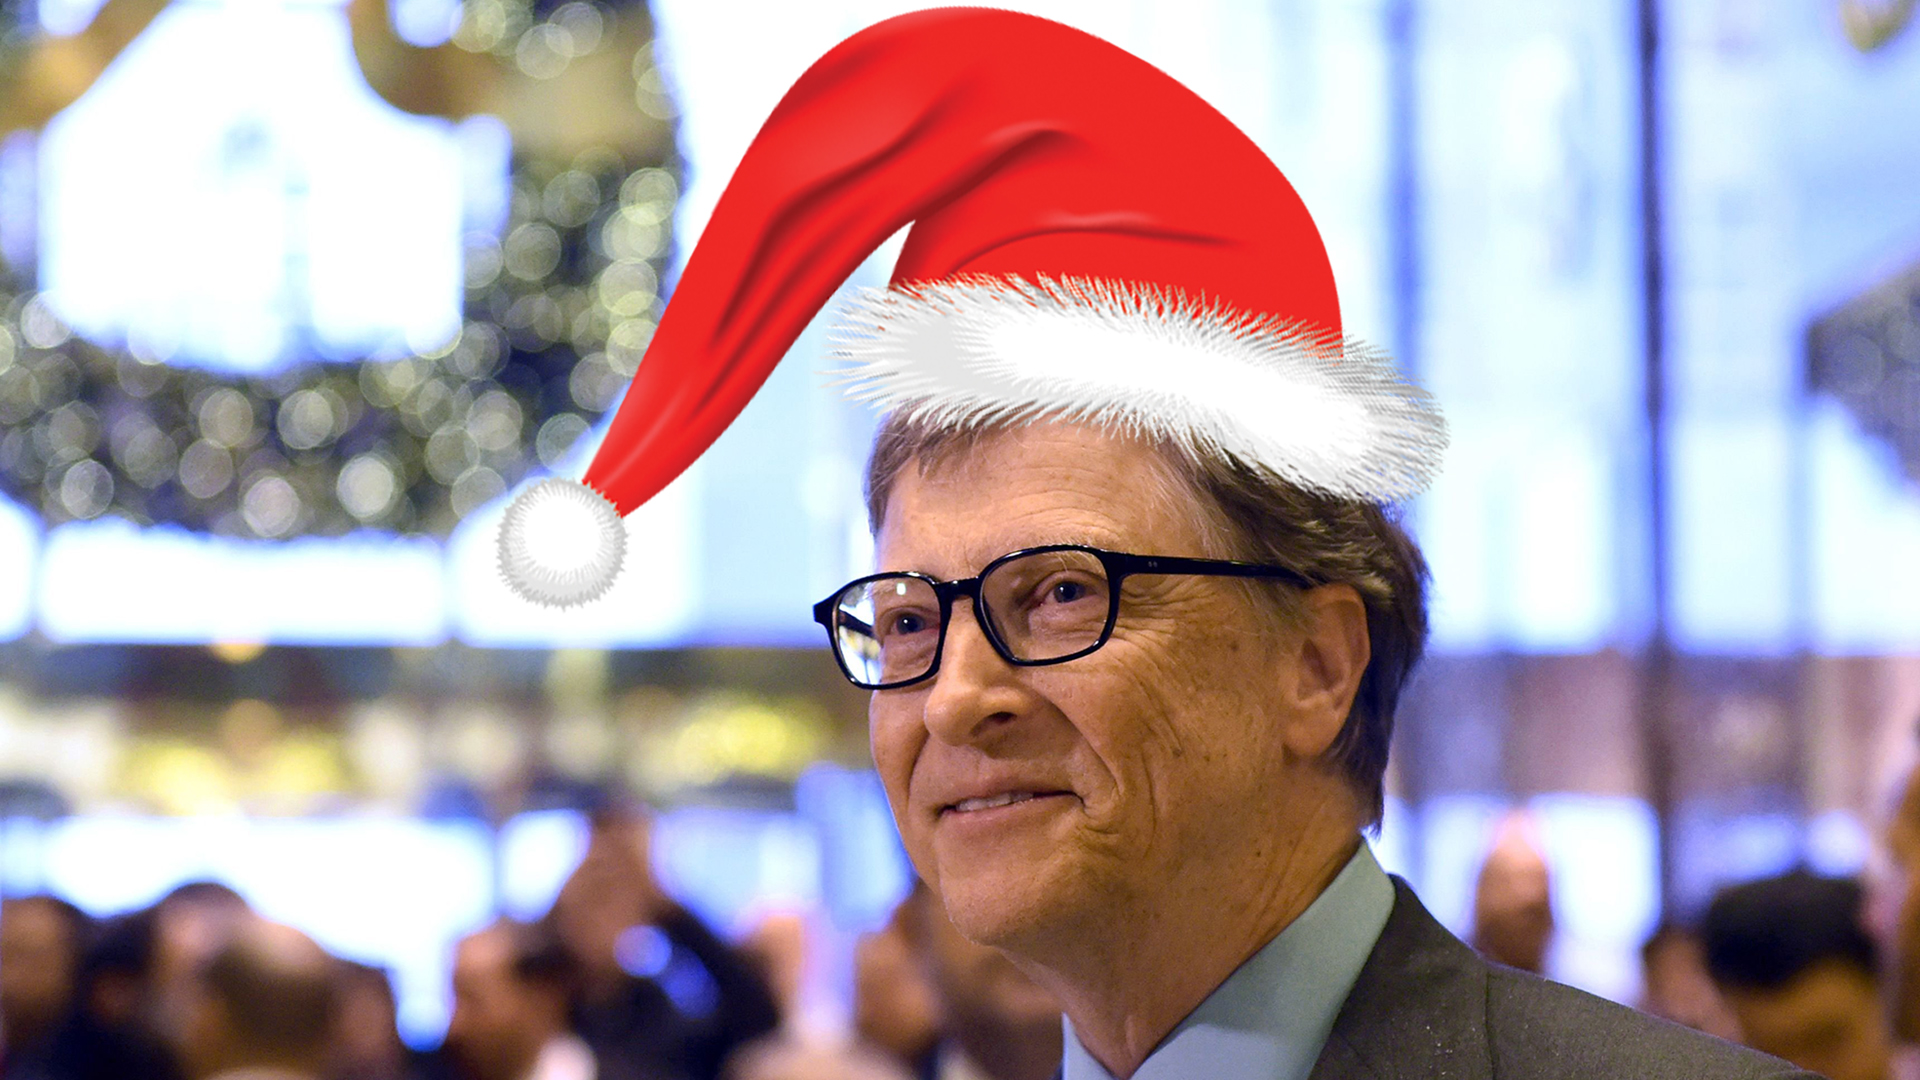 Bill Gates All Car >> Bill Gates as Secret Santa? See redditor's amazing gift haul - TODAY.com